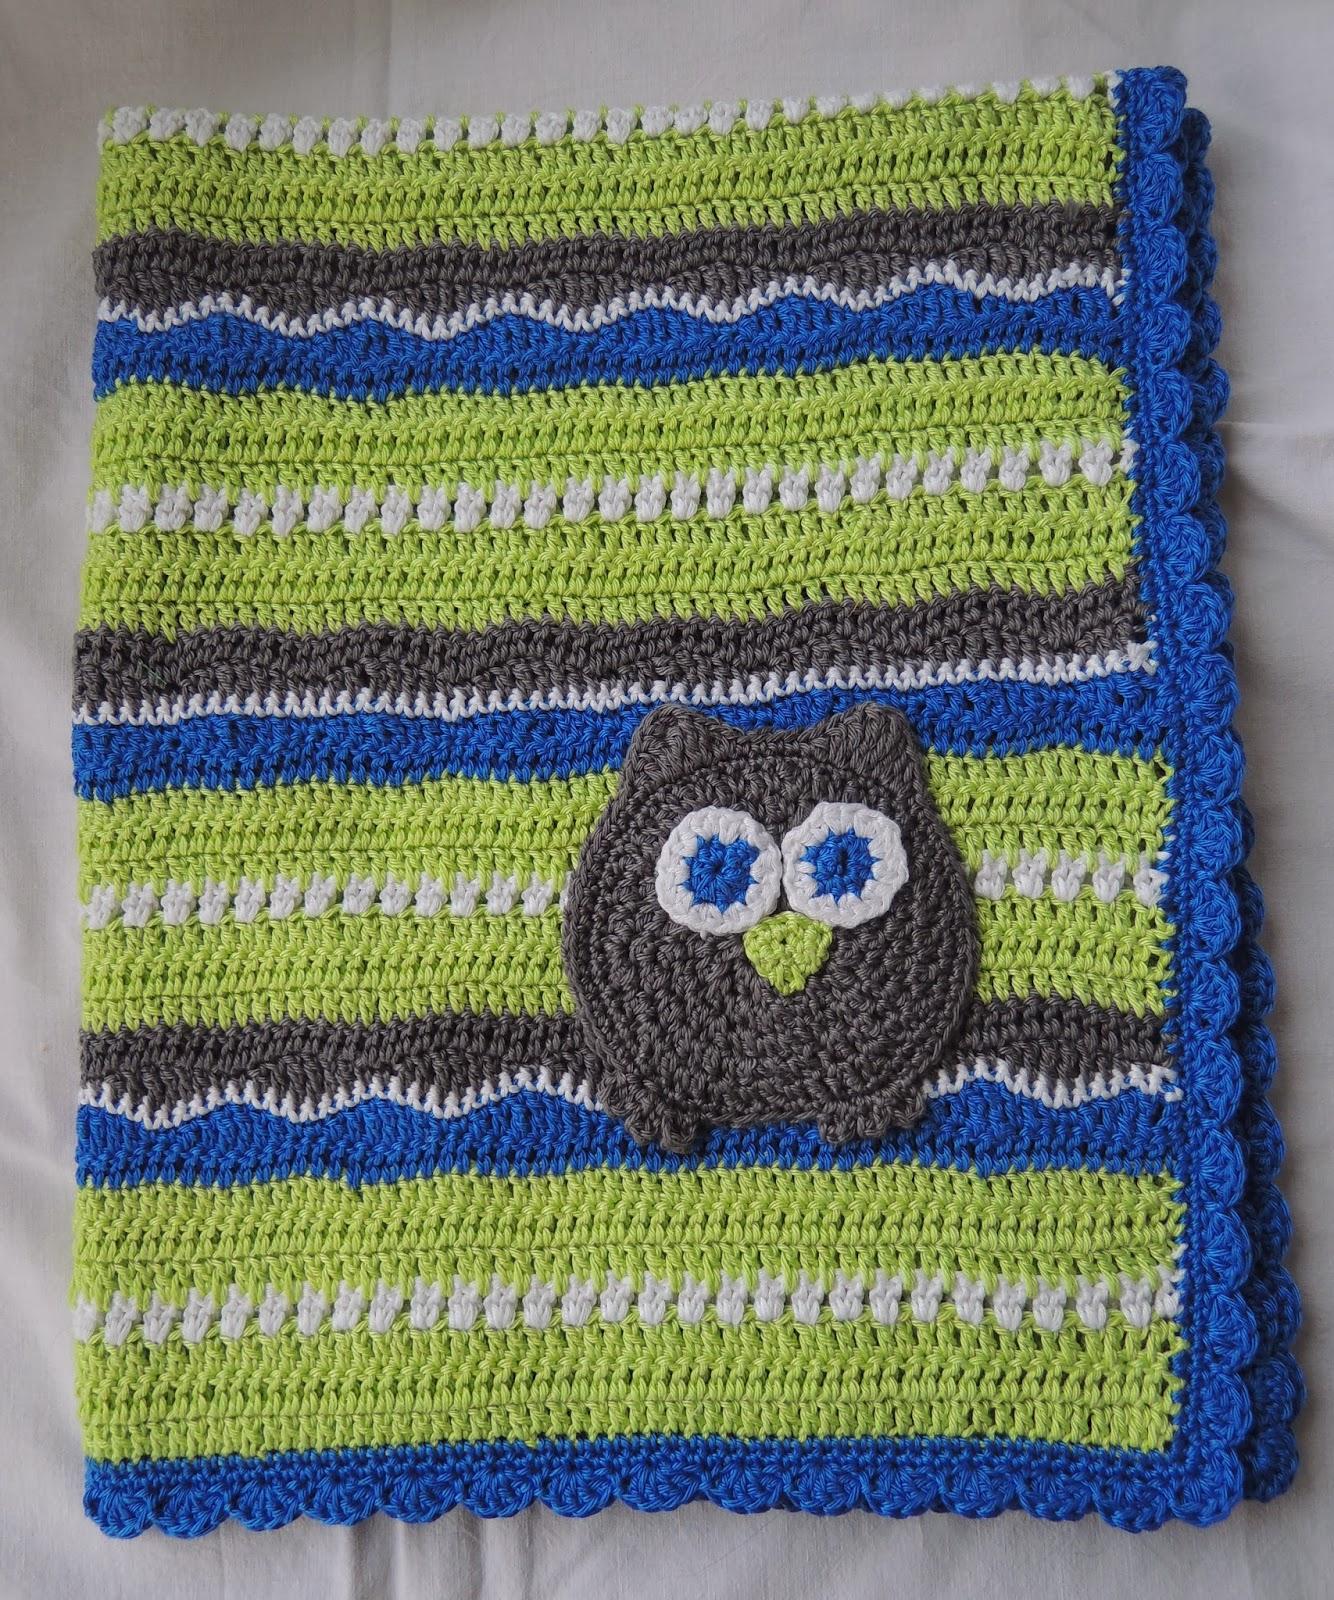 d\'Inge: Häkel-Babydecke grün/blau/grau mit Eule